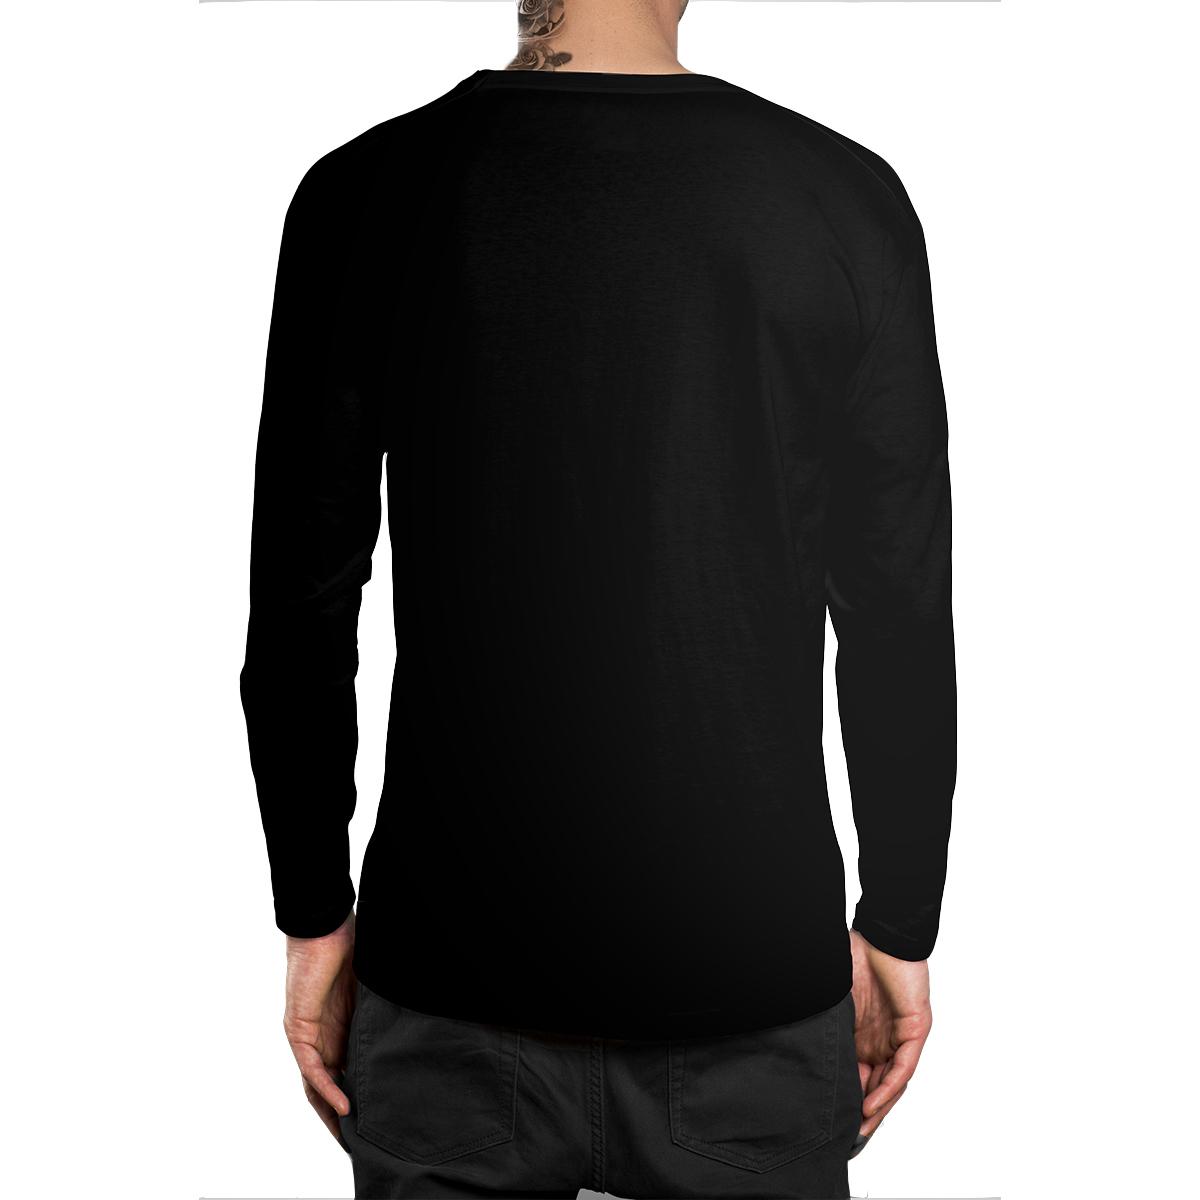 Stompy Camiseta Manga Longa Modelo 26